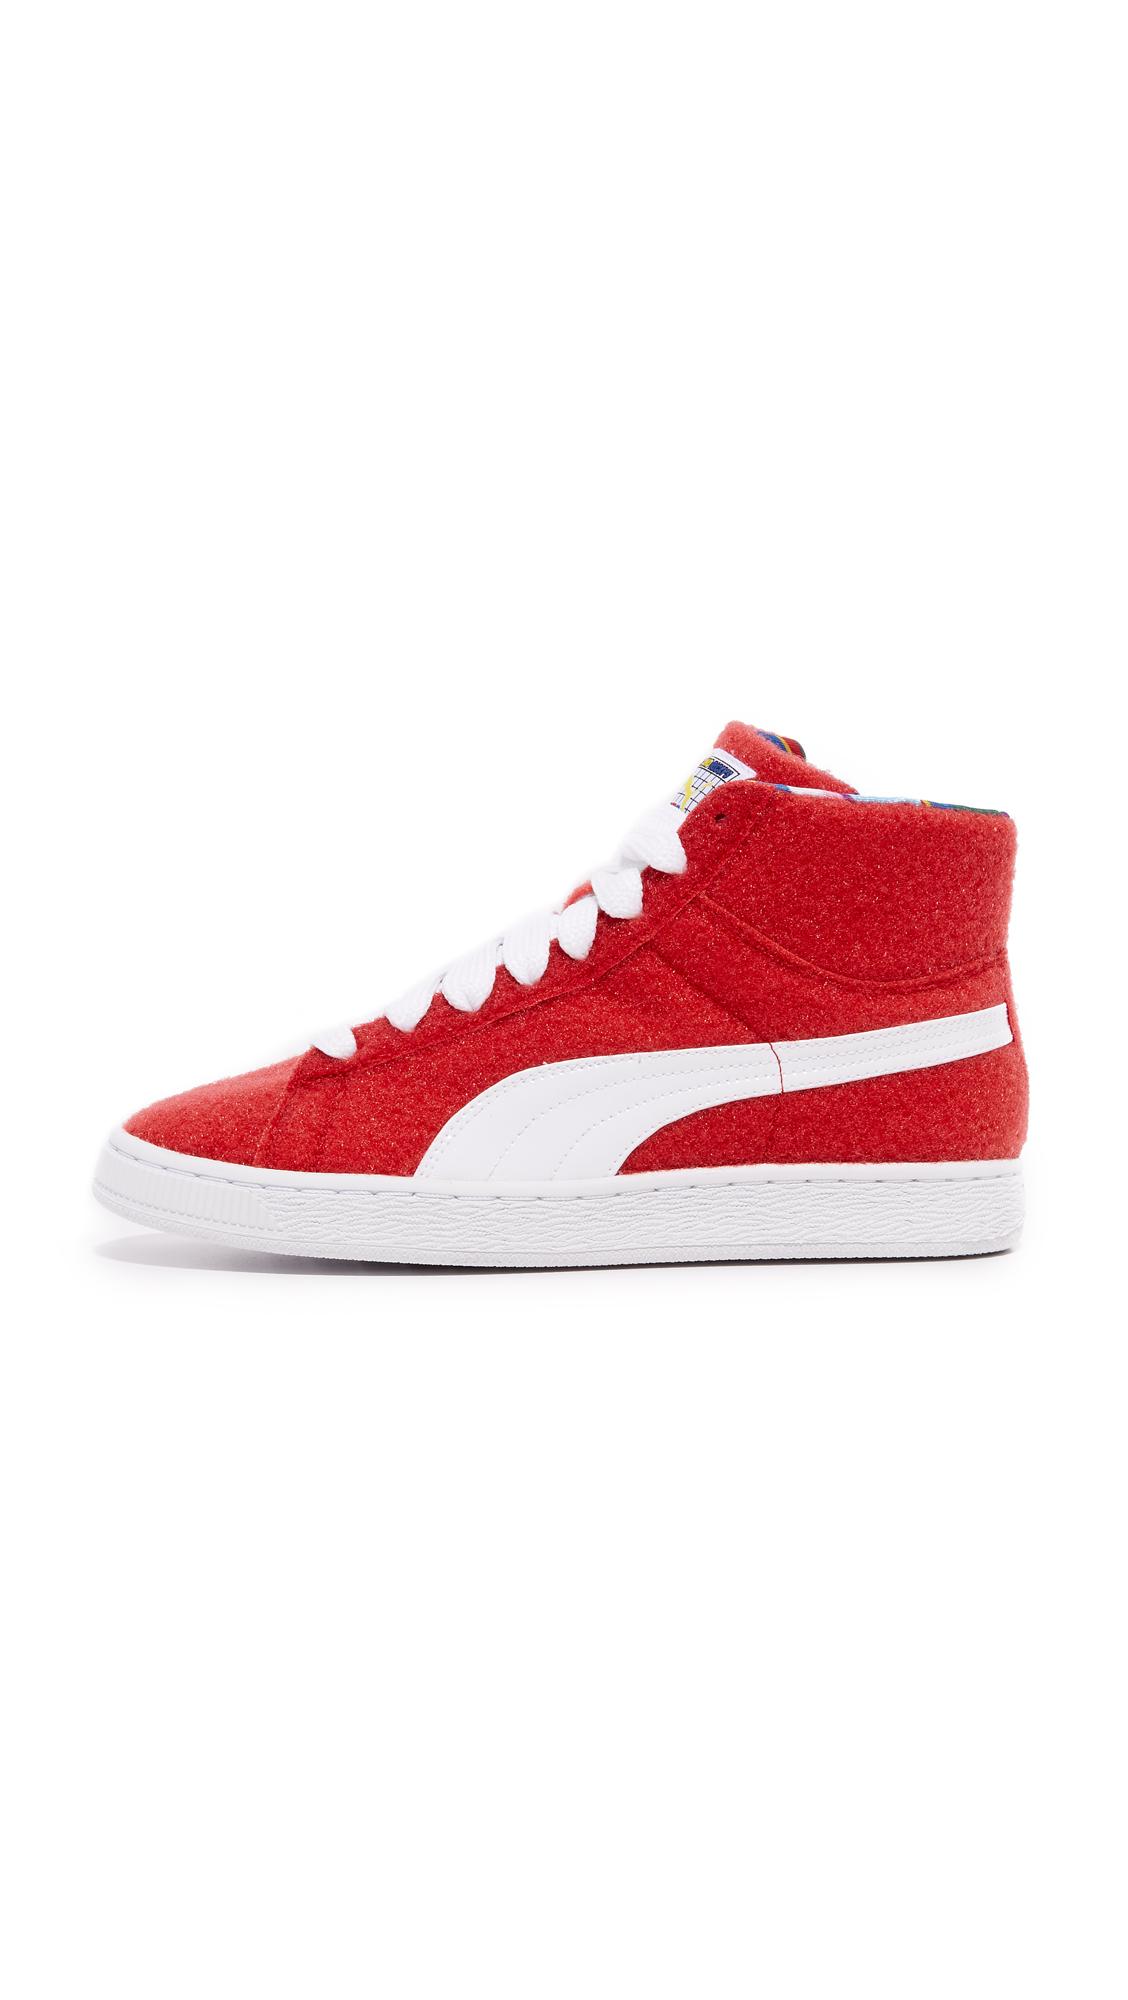 fe24d074bbdc PUMA PUMA x Dee   Ricky Basket CR Sneakers